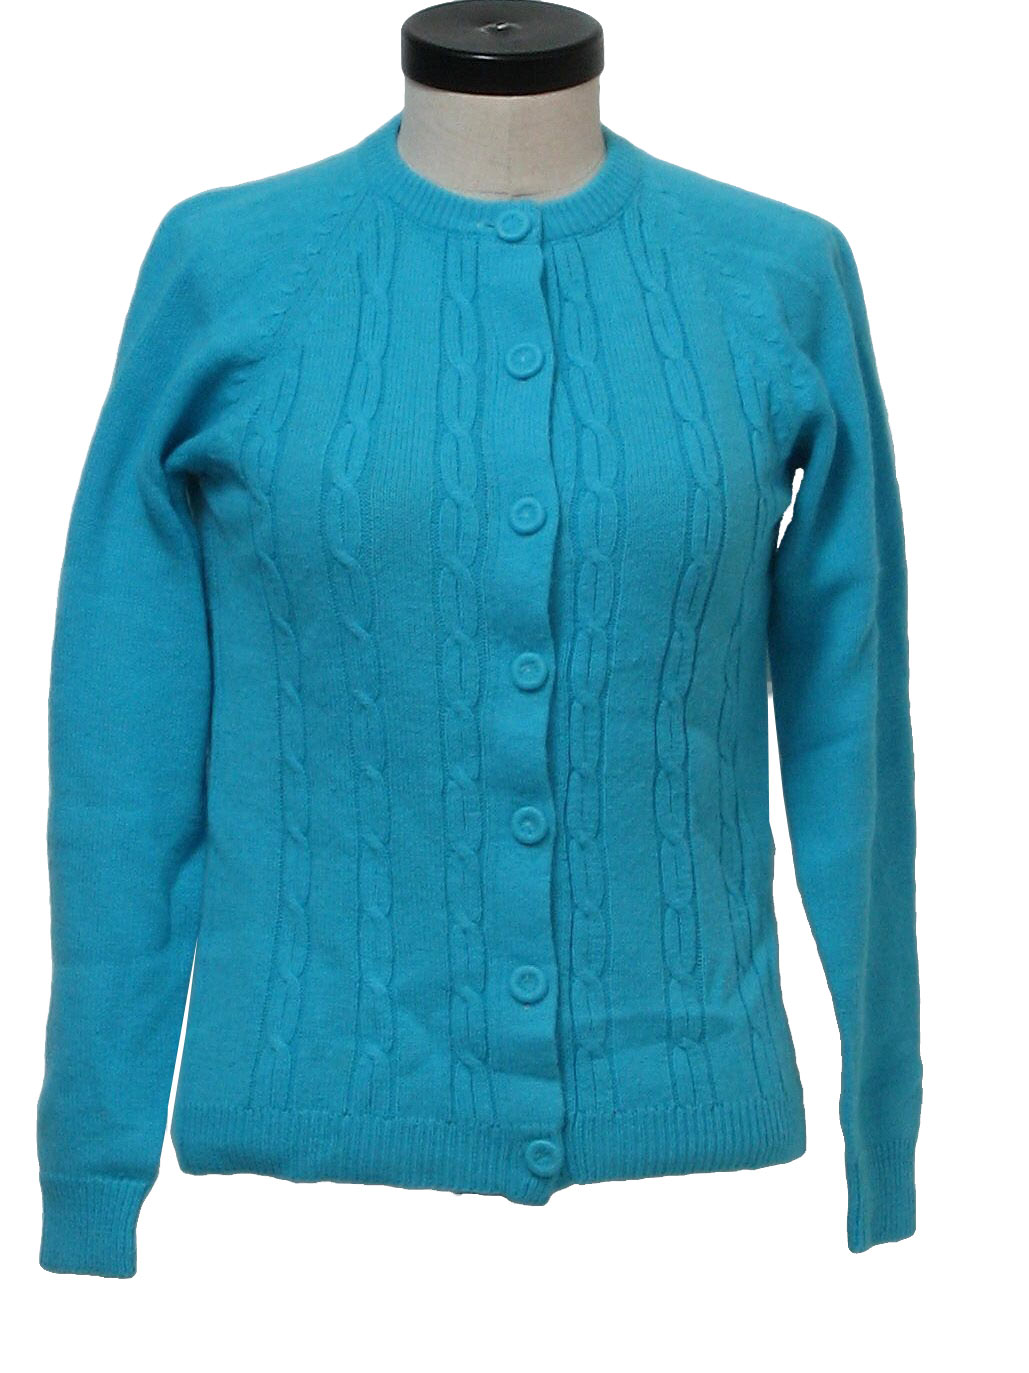 Seventies Vintage Caridgan Sweater: 70s (60s inspired) -Sally ...